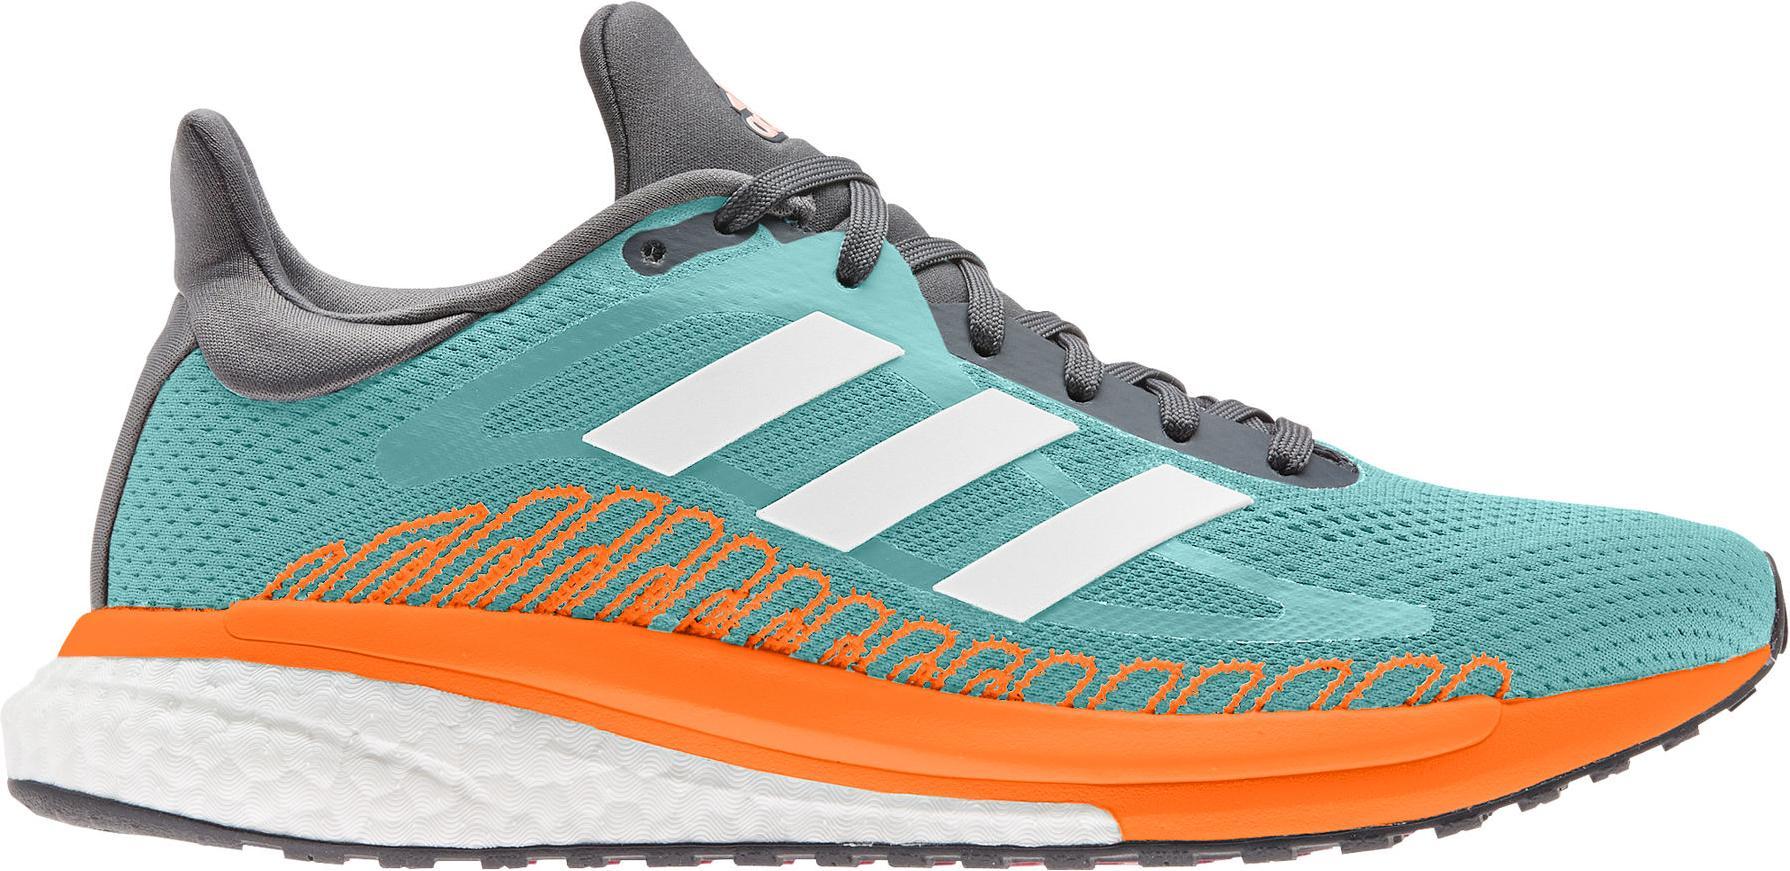 Zapatillas de running adidas SOLAR GLIDE ST 3 W